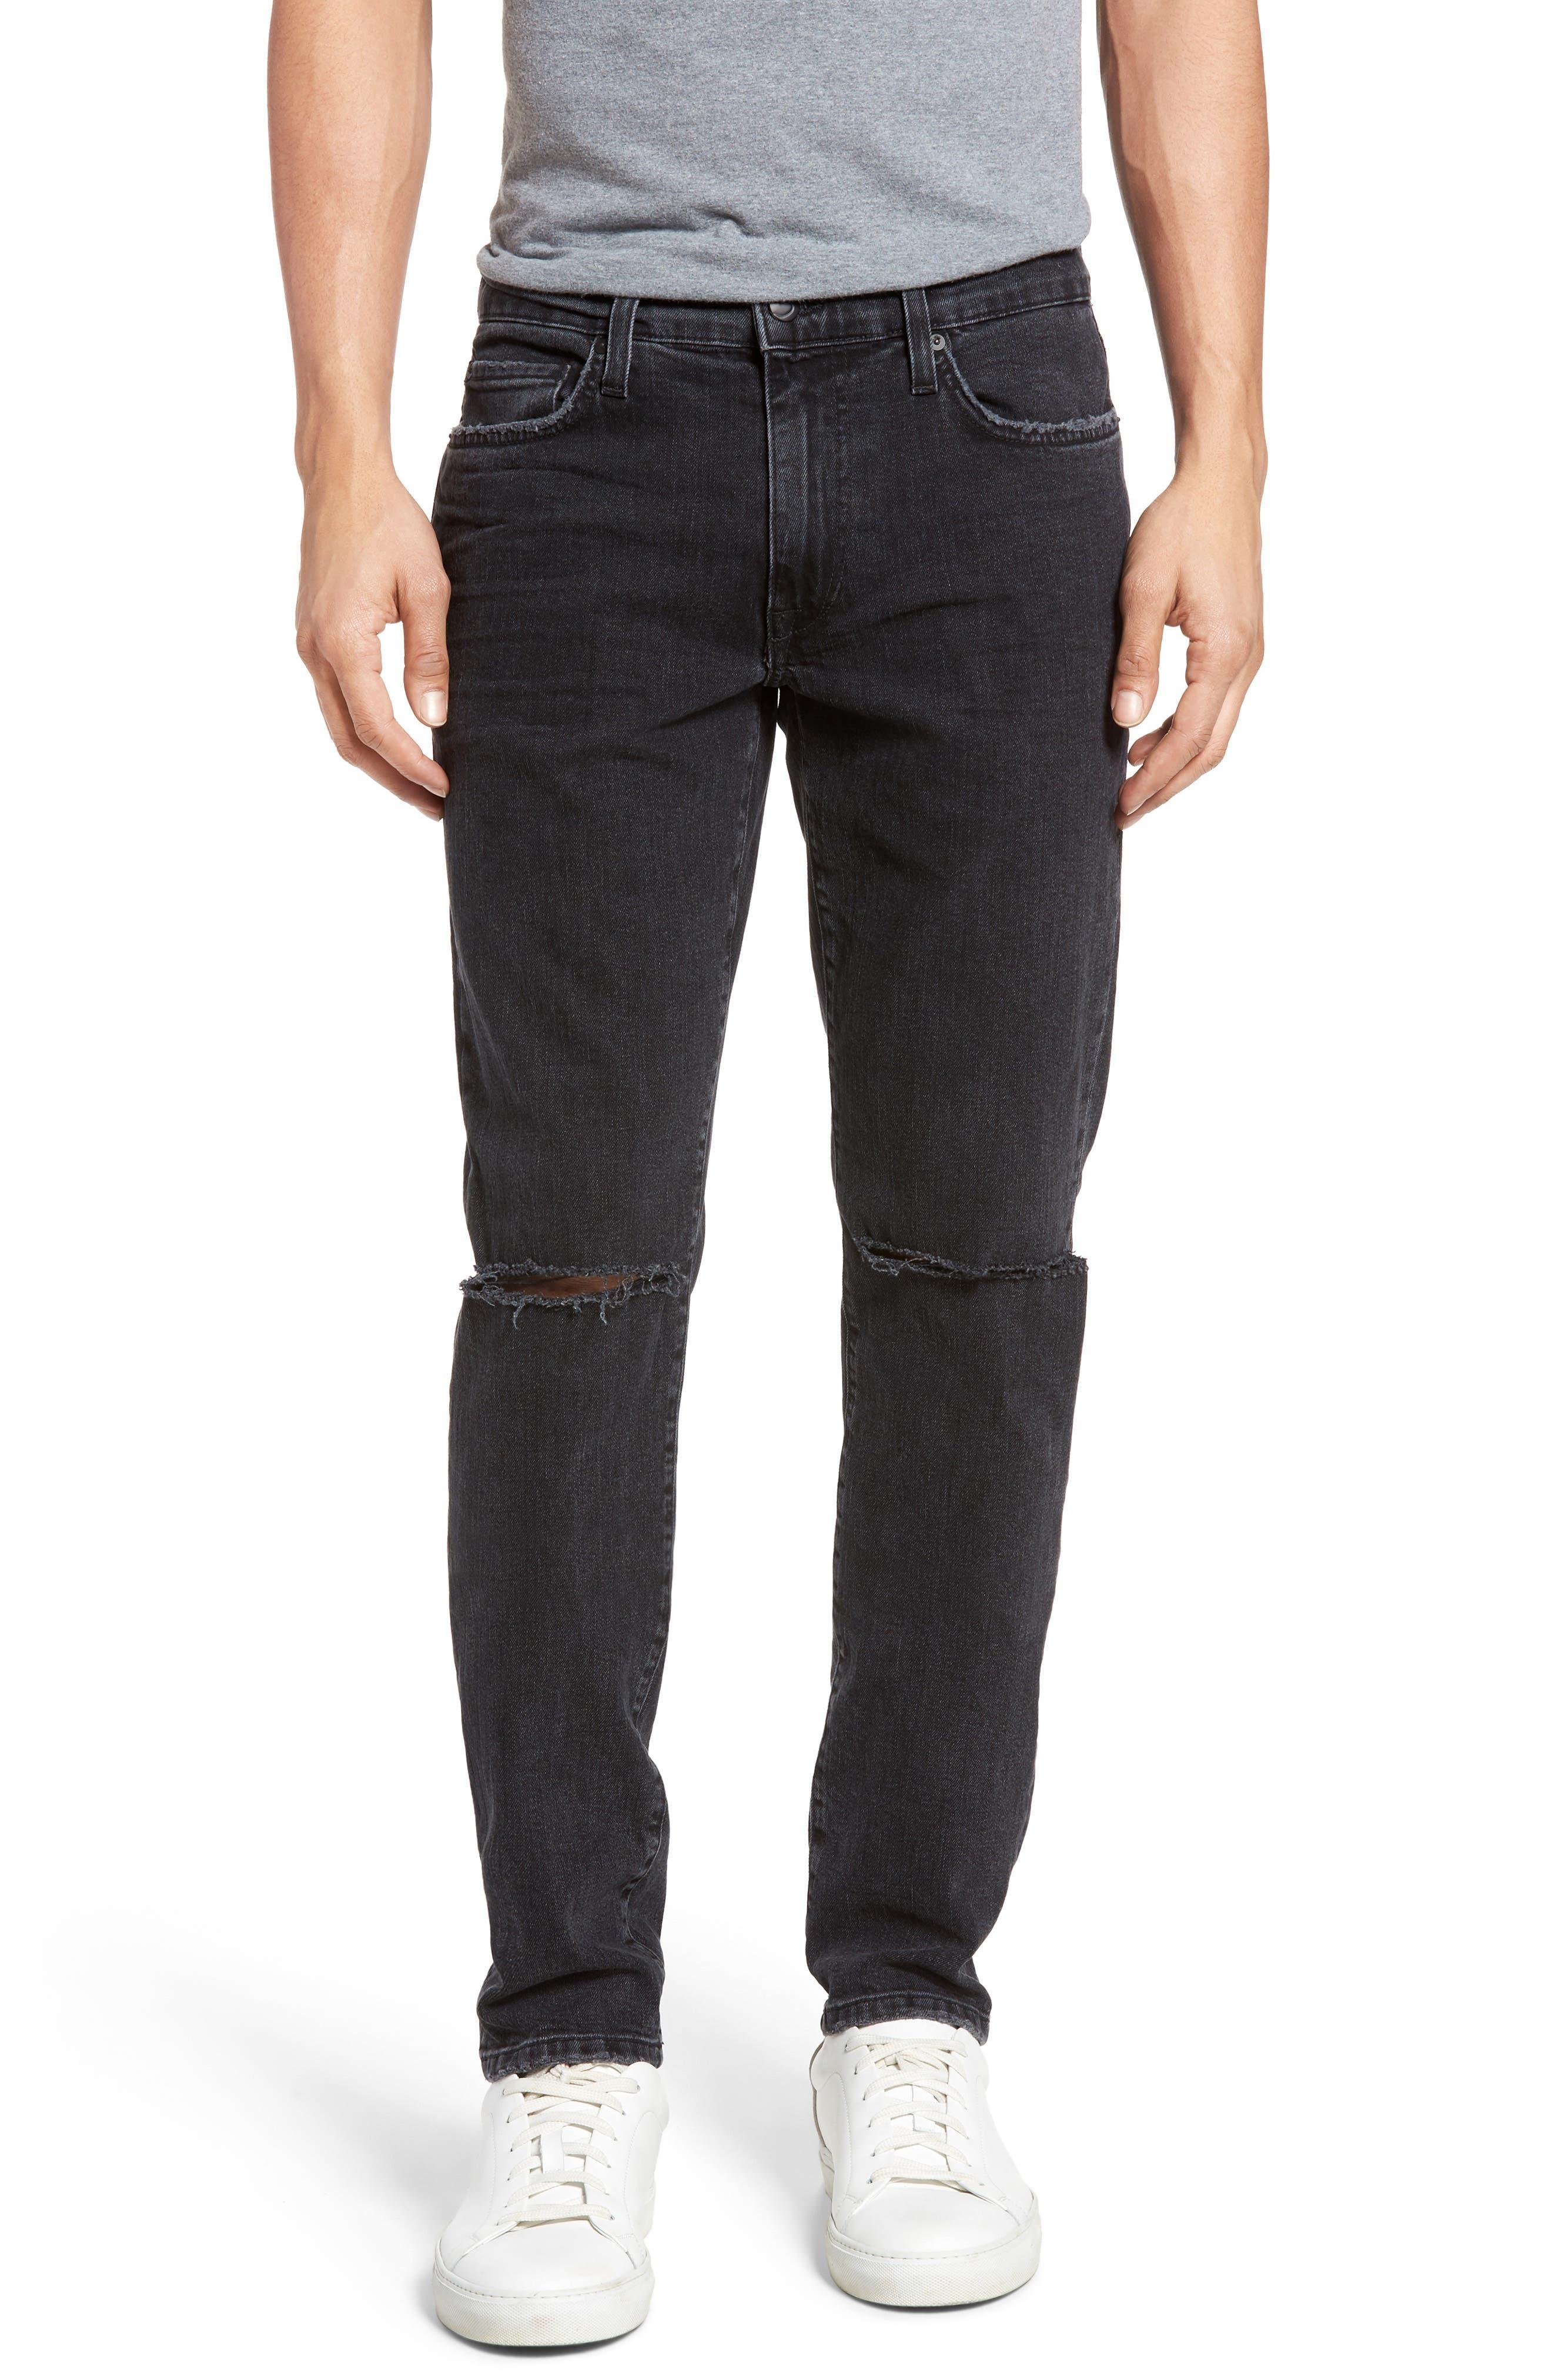 Brixton Slim Straight Fit Jeans,                         Main,                         color, Idris